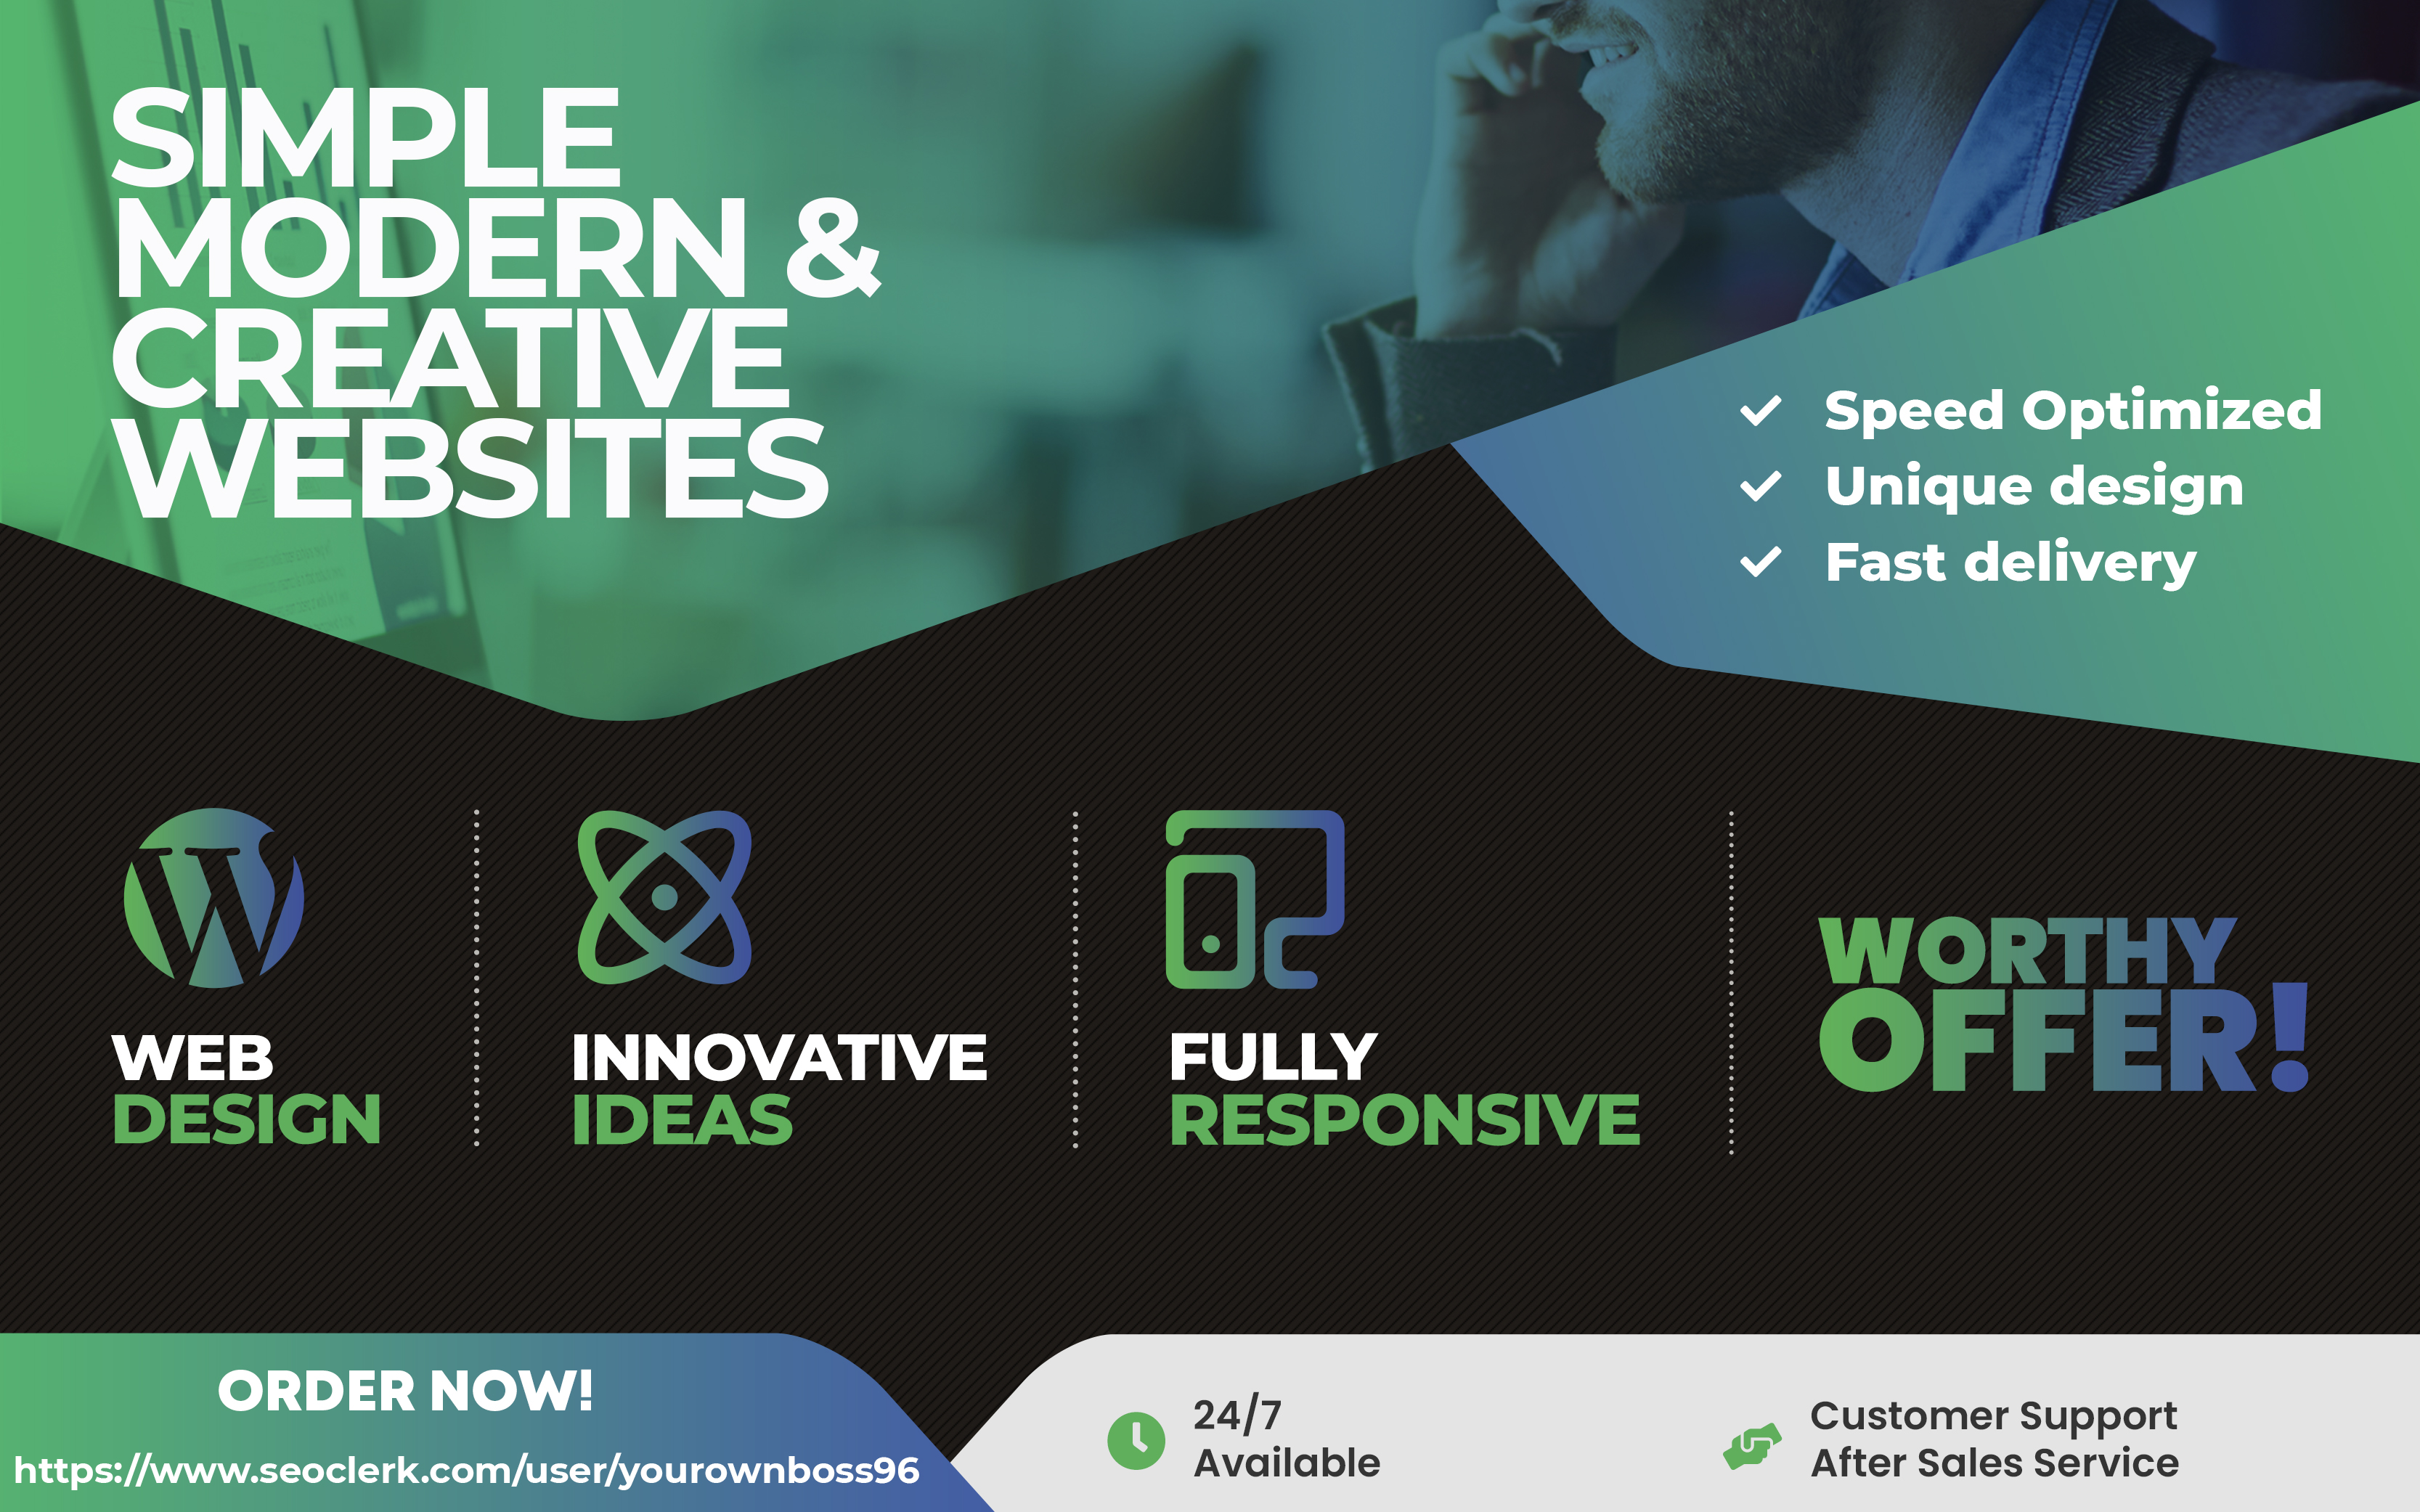 Web design and develop stunning WordPress websites